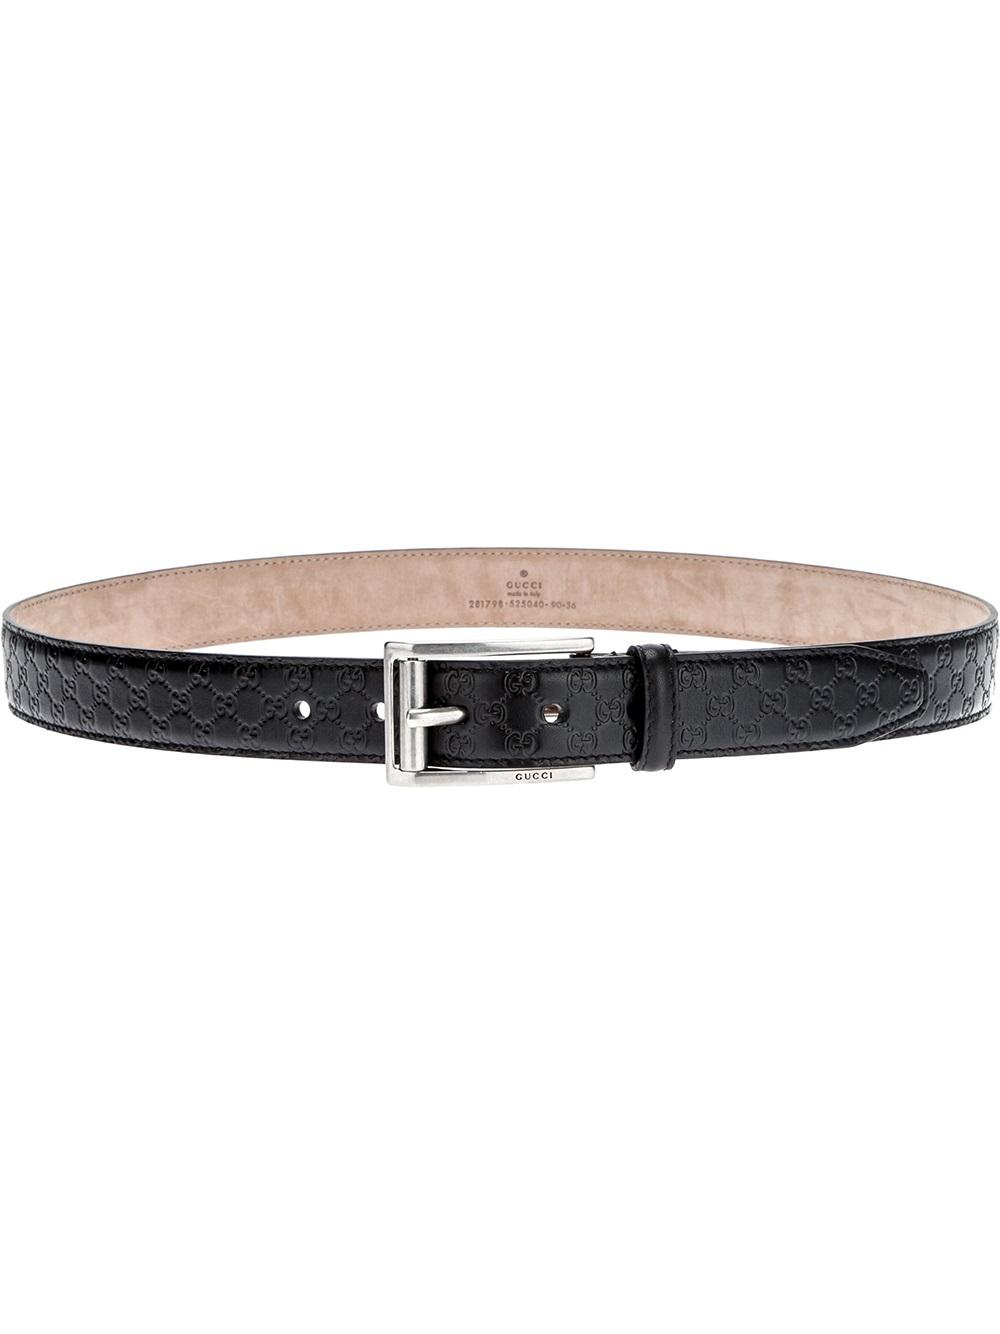 9533dd38baa ... italy lyst gucci monogram embossed belt in black for men 3db30 cbe8a